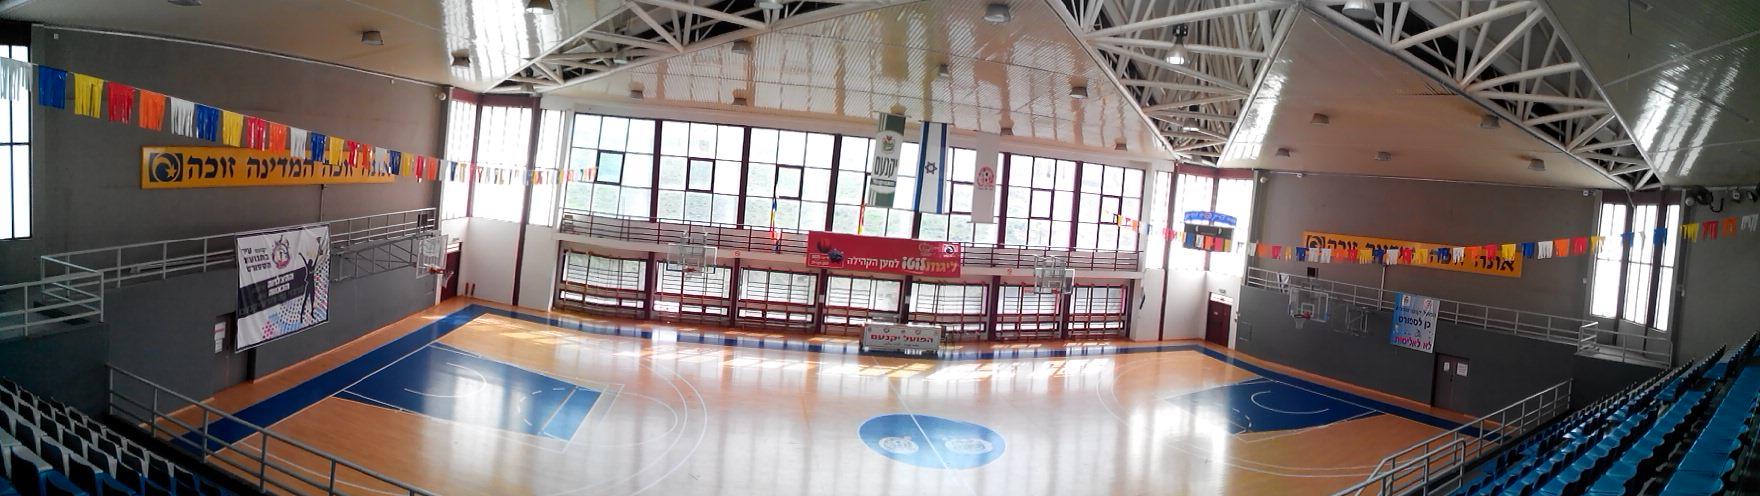 Indoor Basketball Courts Long Island